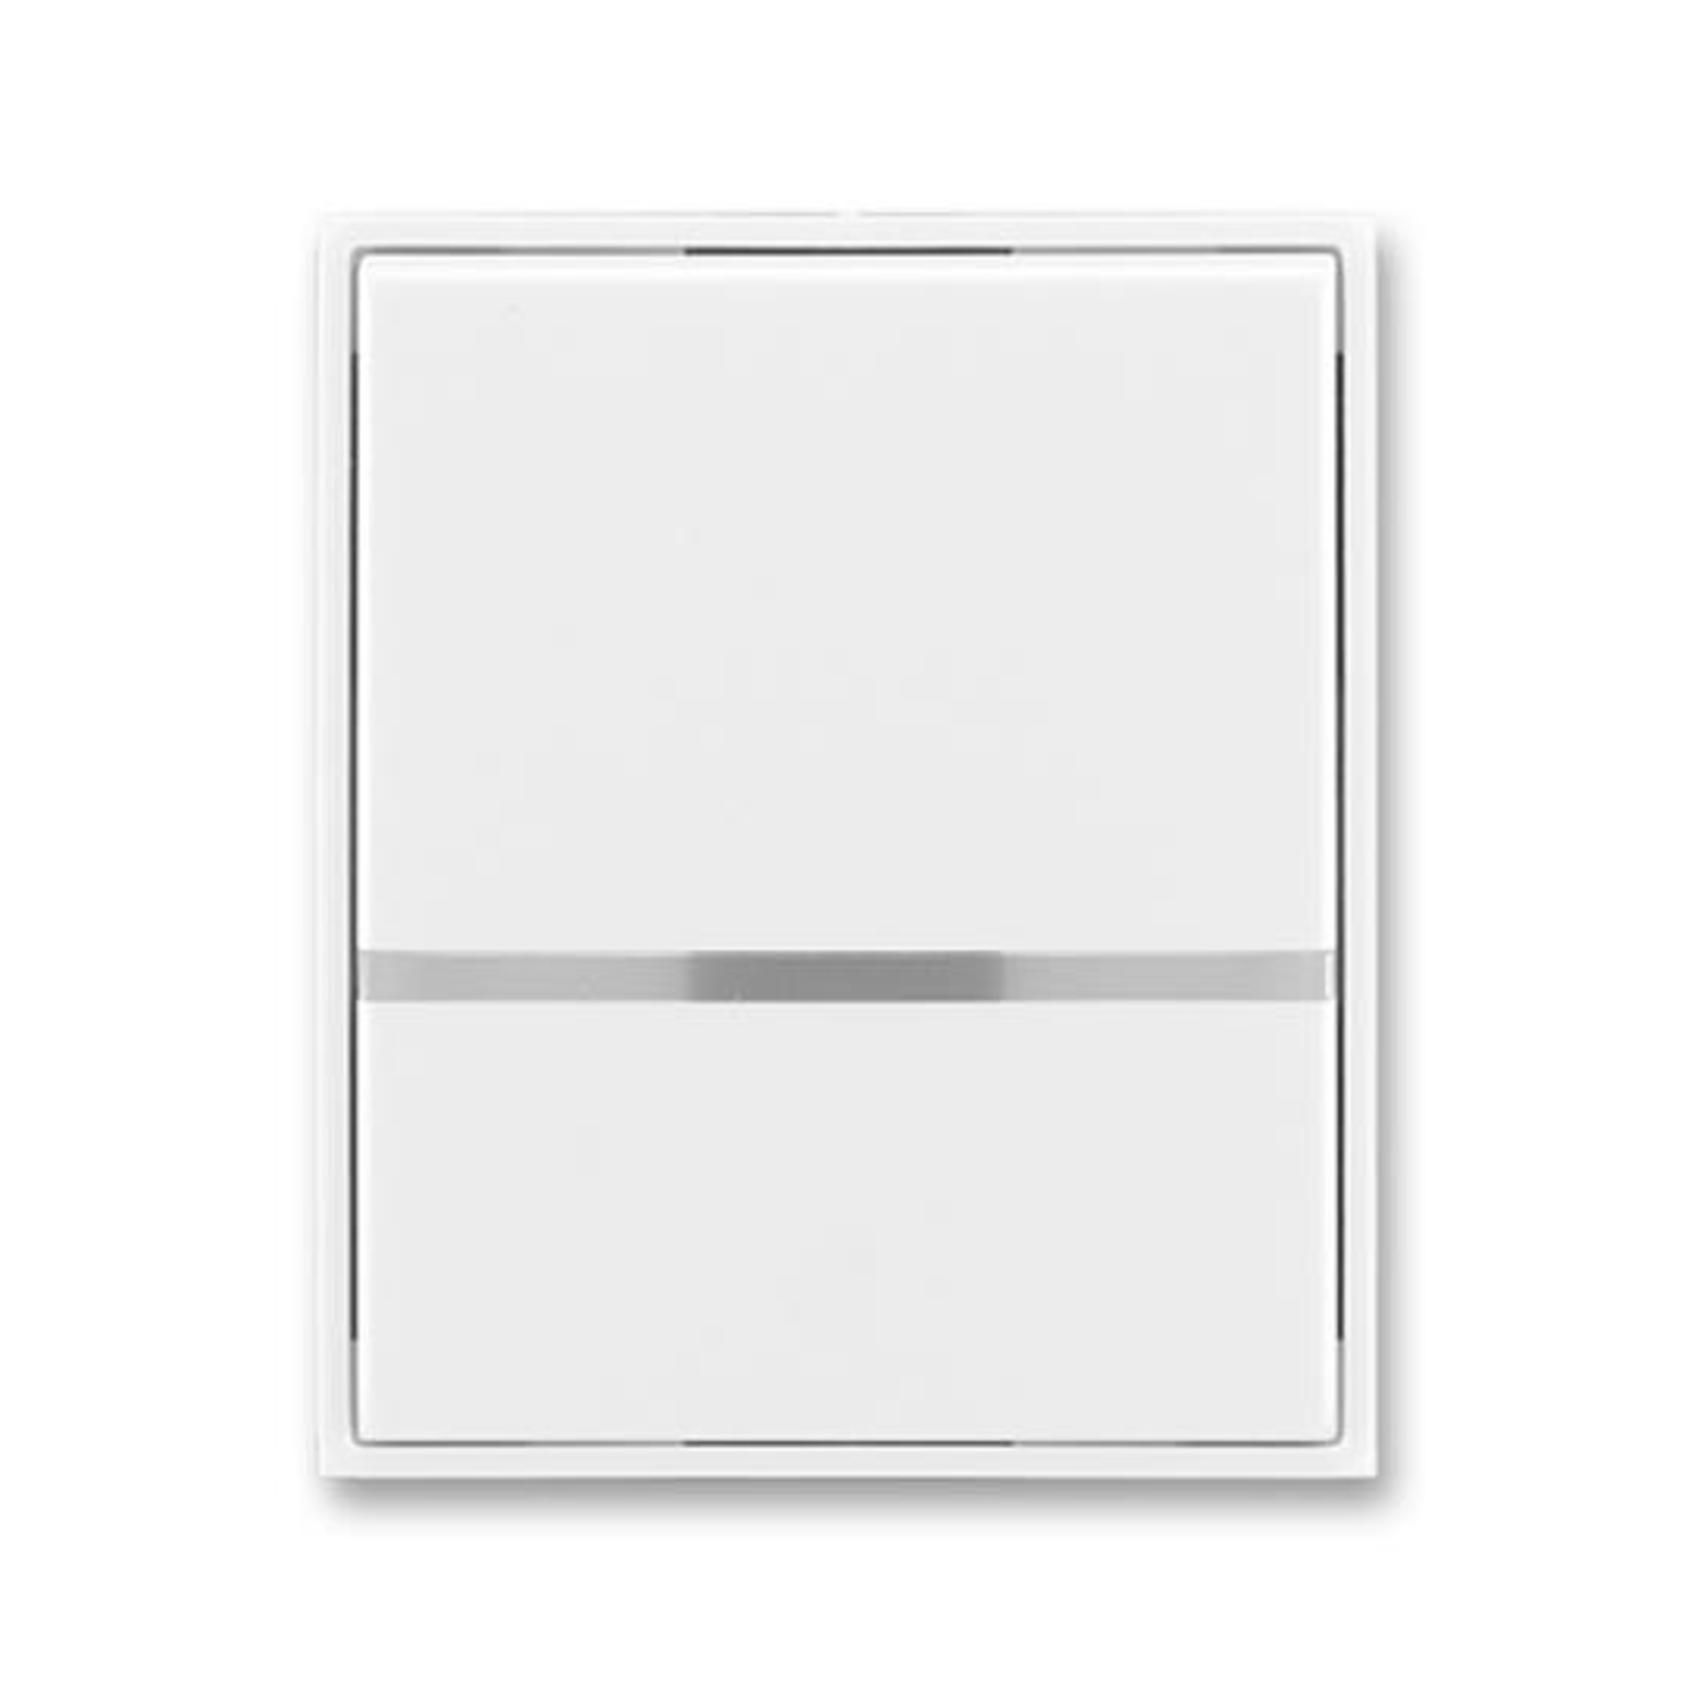 ABB 3558E-A00653 03 Element Kryt spínače jednoduchý, s průzorem